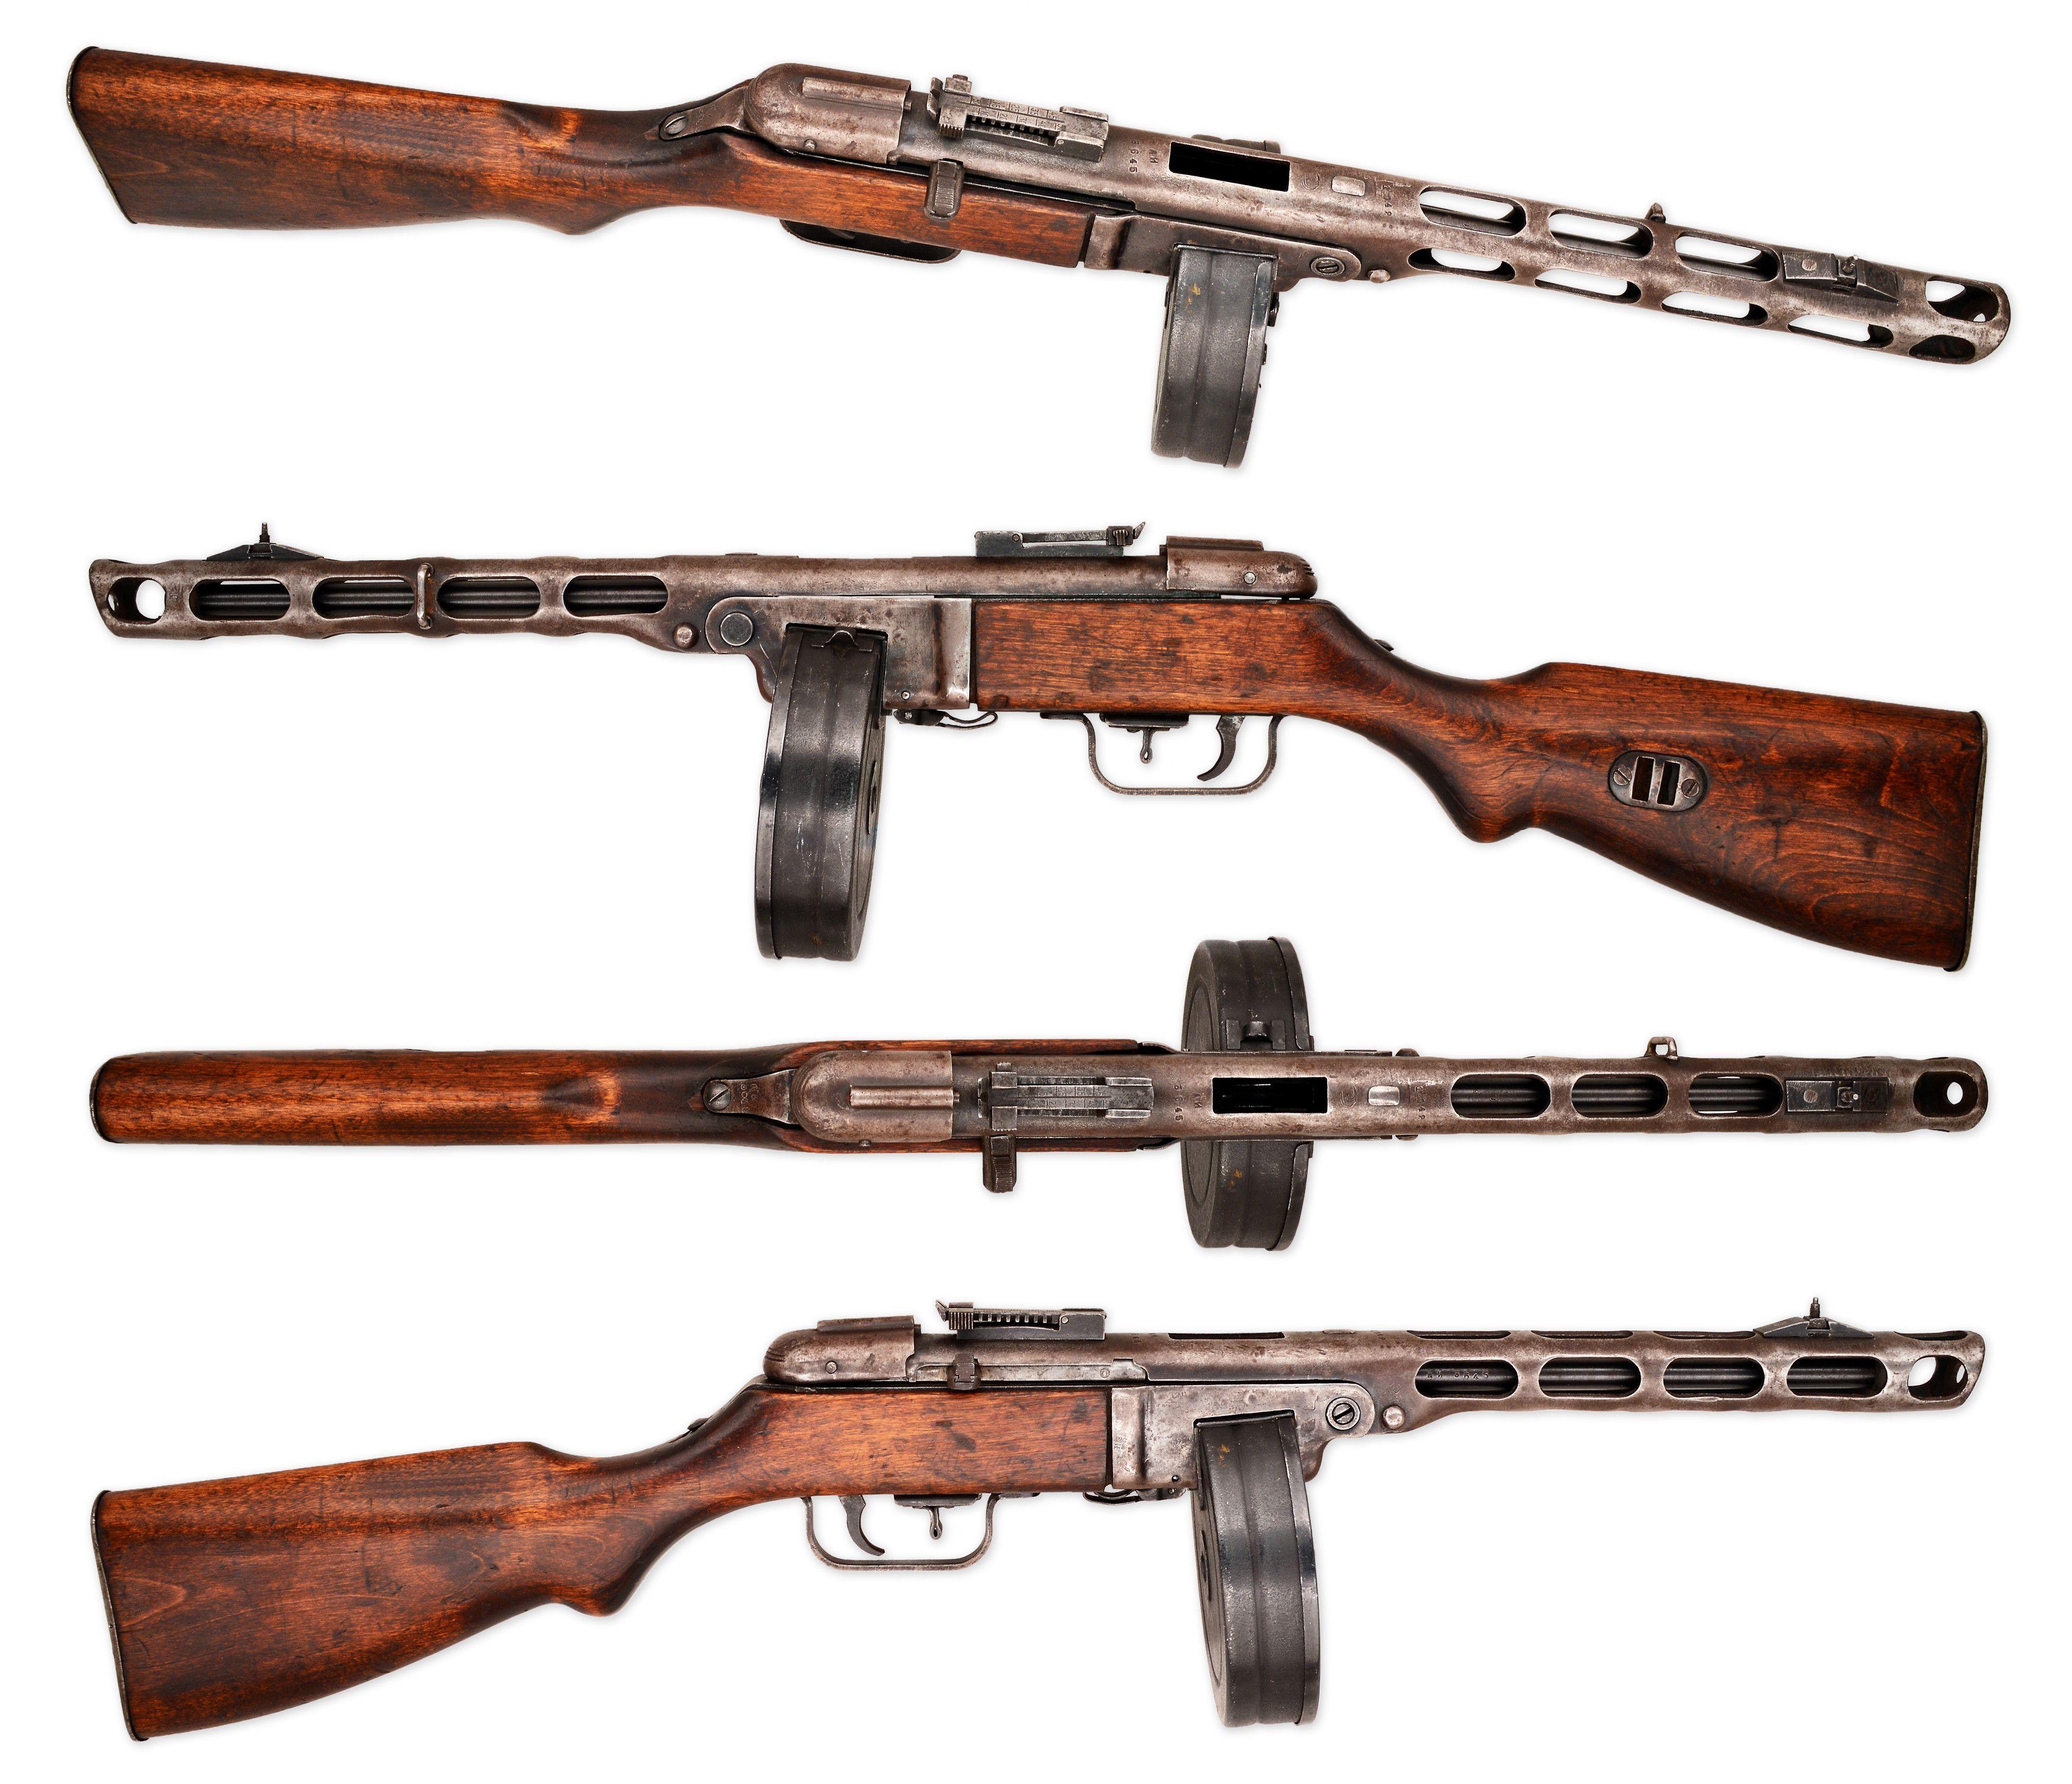 Anatomy: PPSH-41 submachine gun | Pinterest | Submachine gun ...